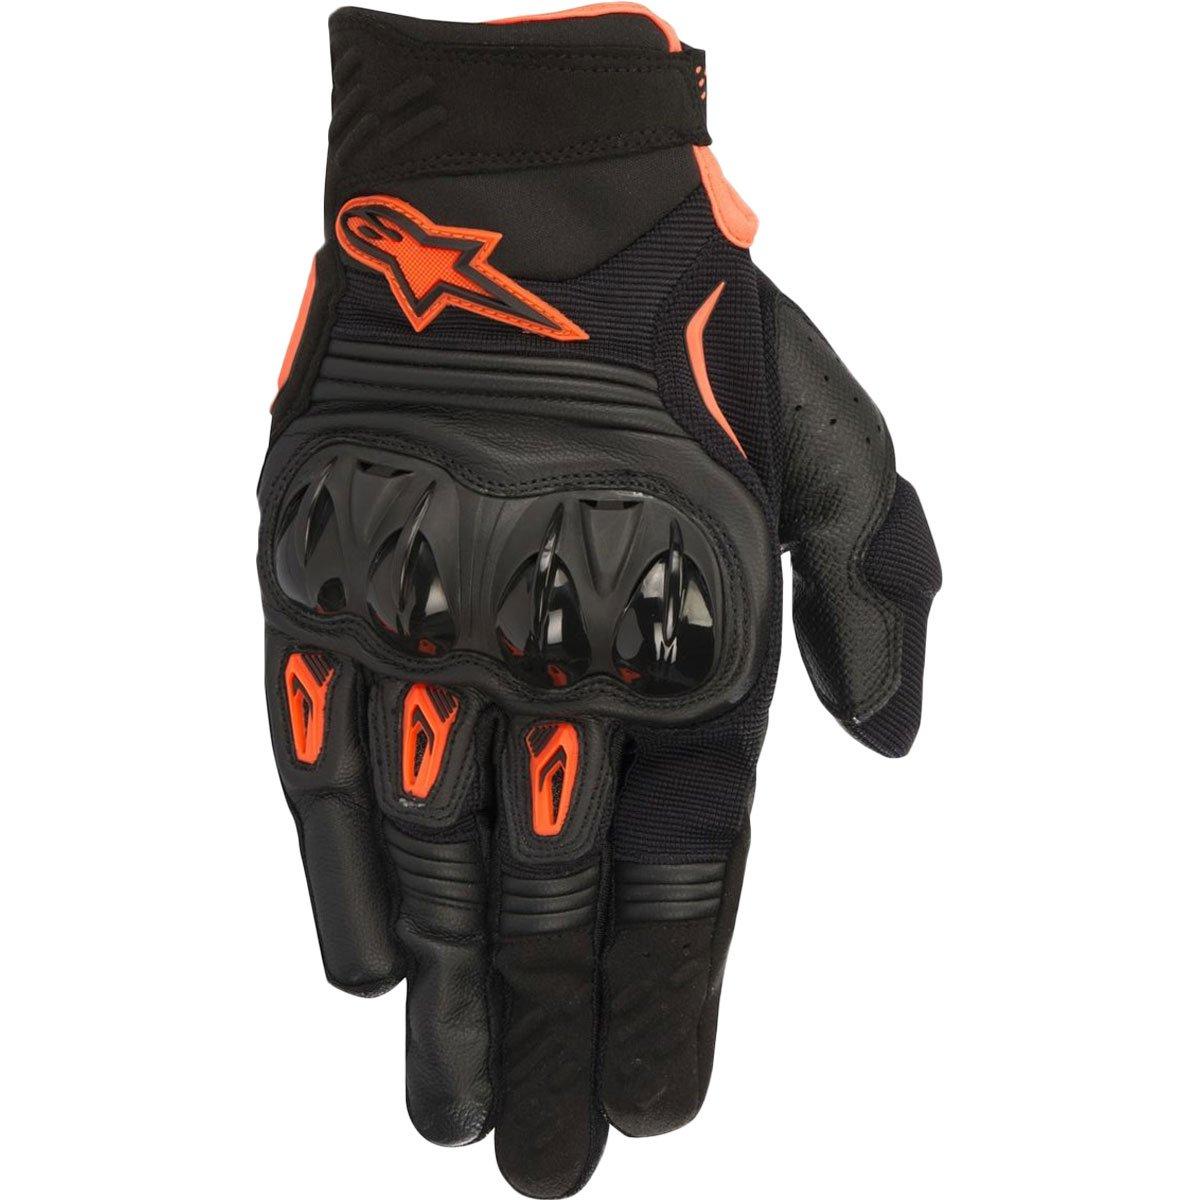 Alpinestars S8 Megawatt Men's Off-Road Motorcycle Gloves - Black/Orange / Large